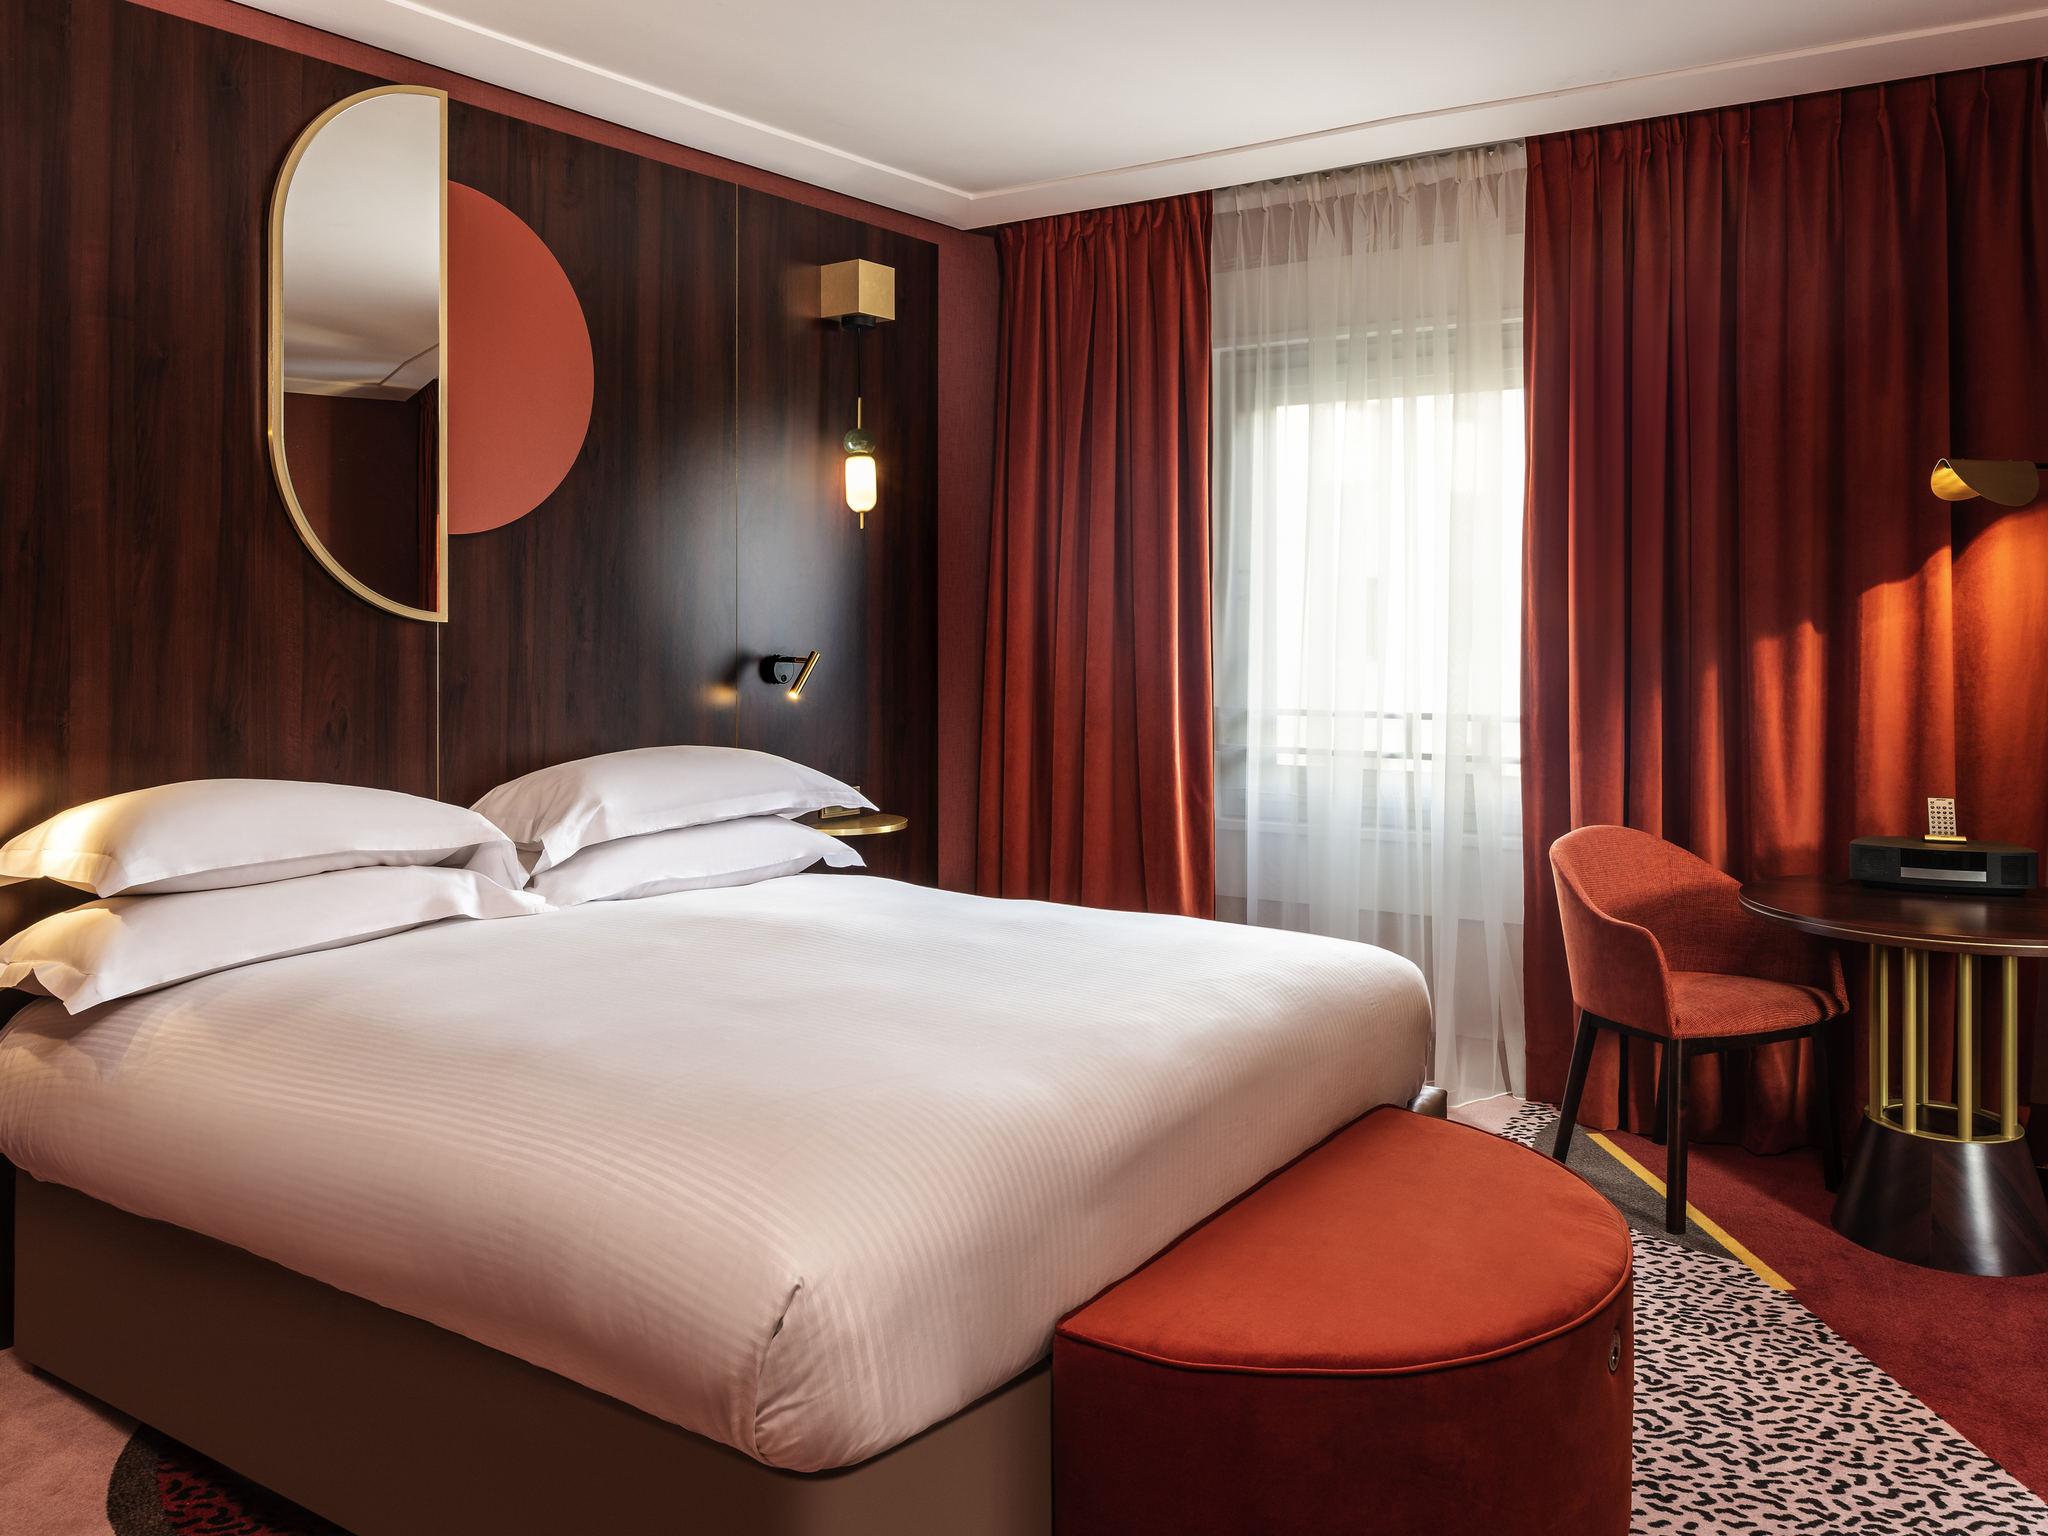 Hotel - Sofitel Paris La Défense